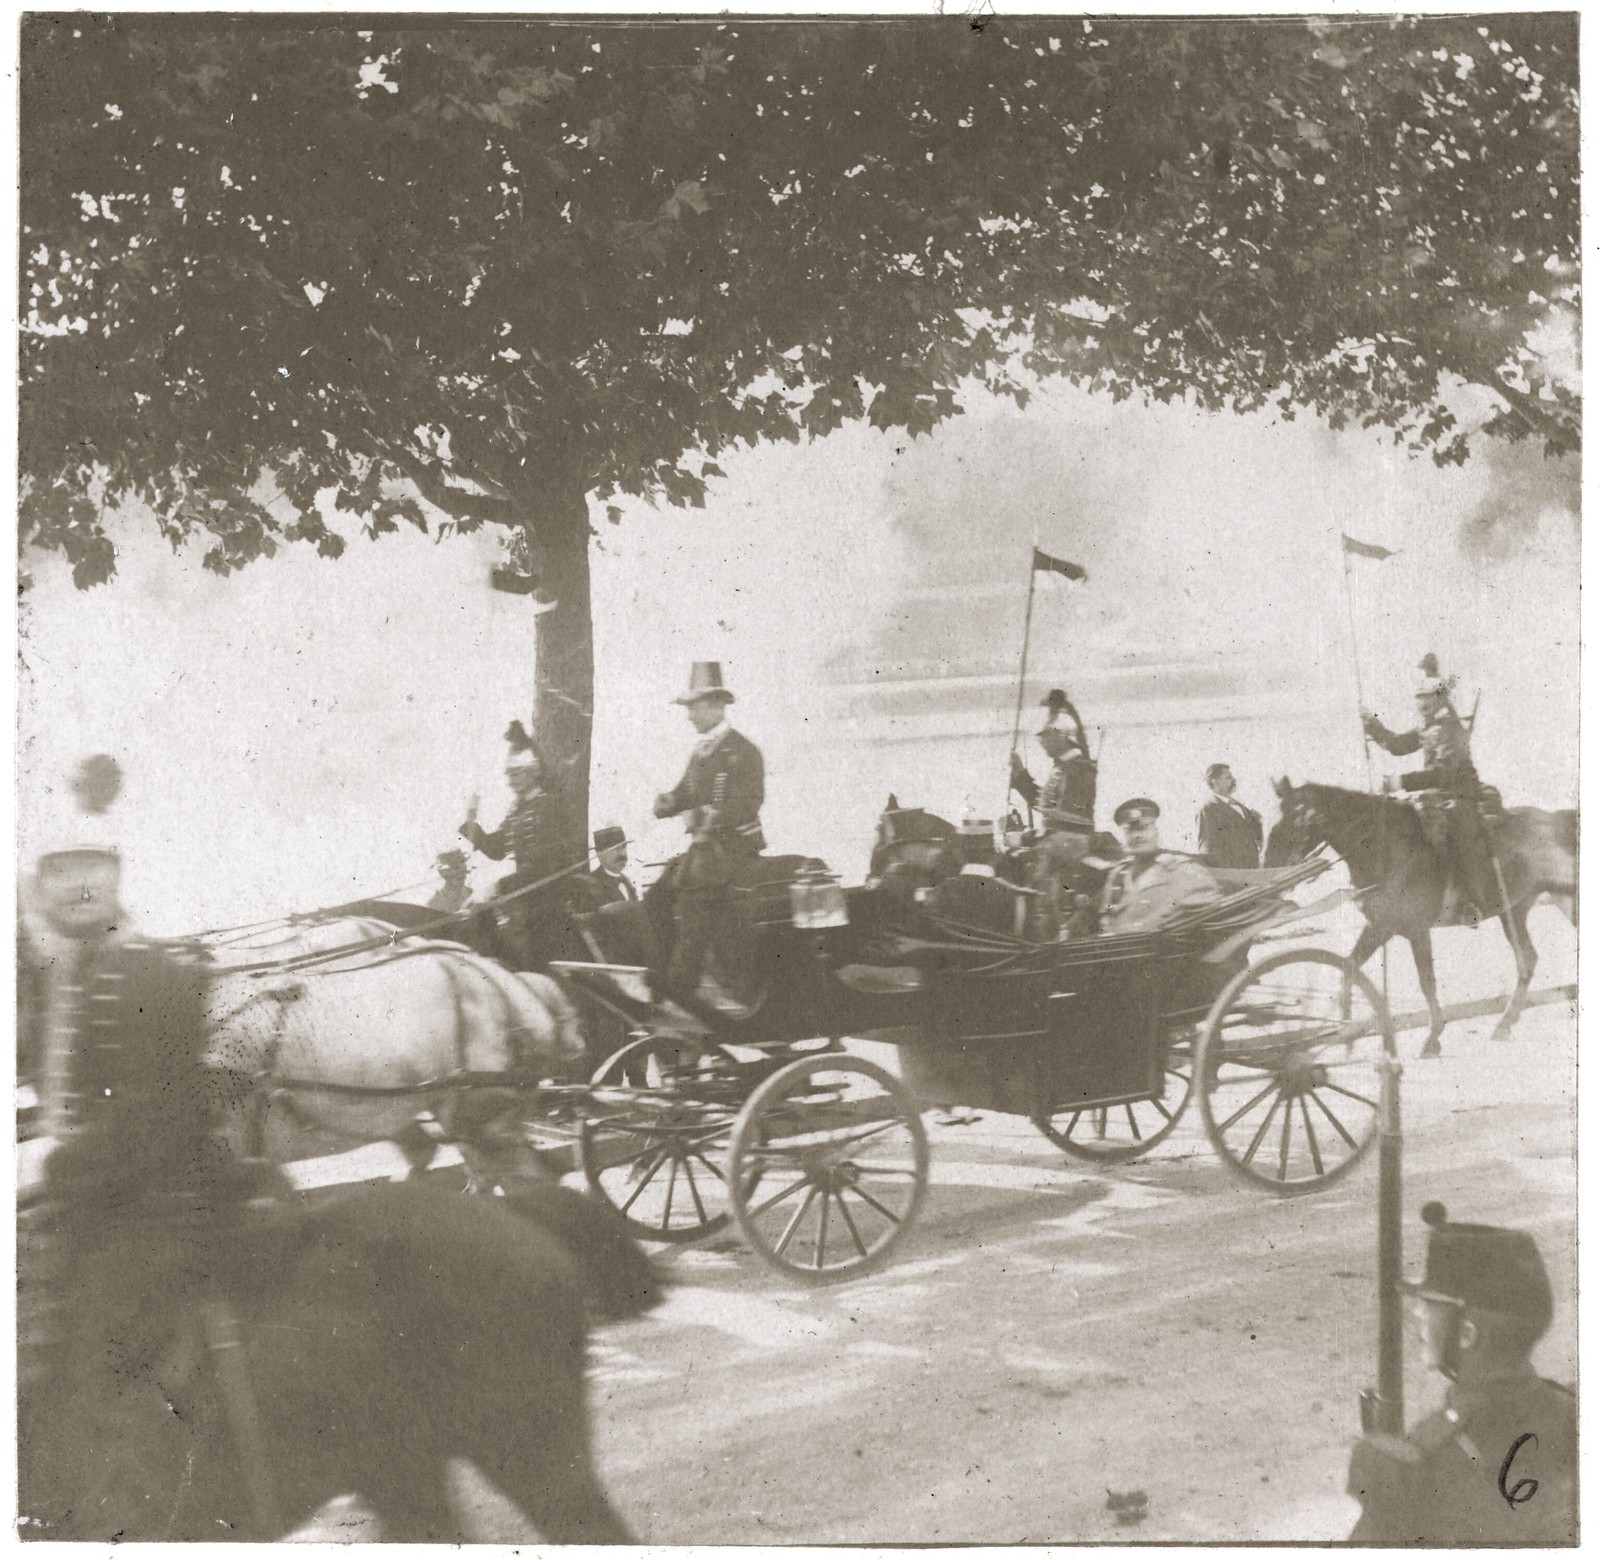 24. Императорский кортеж на улицах Парижа